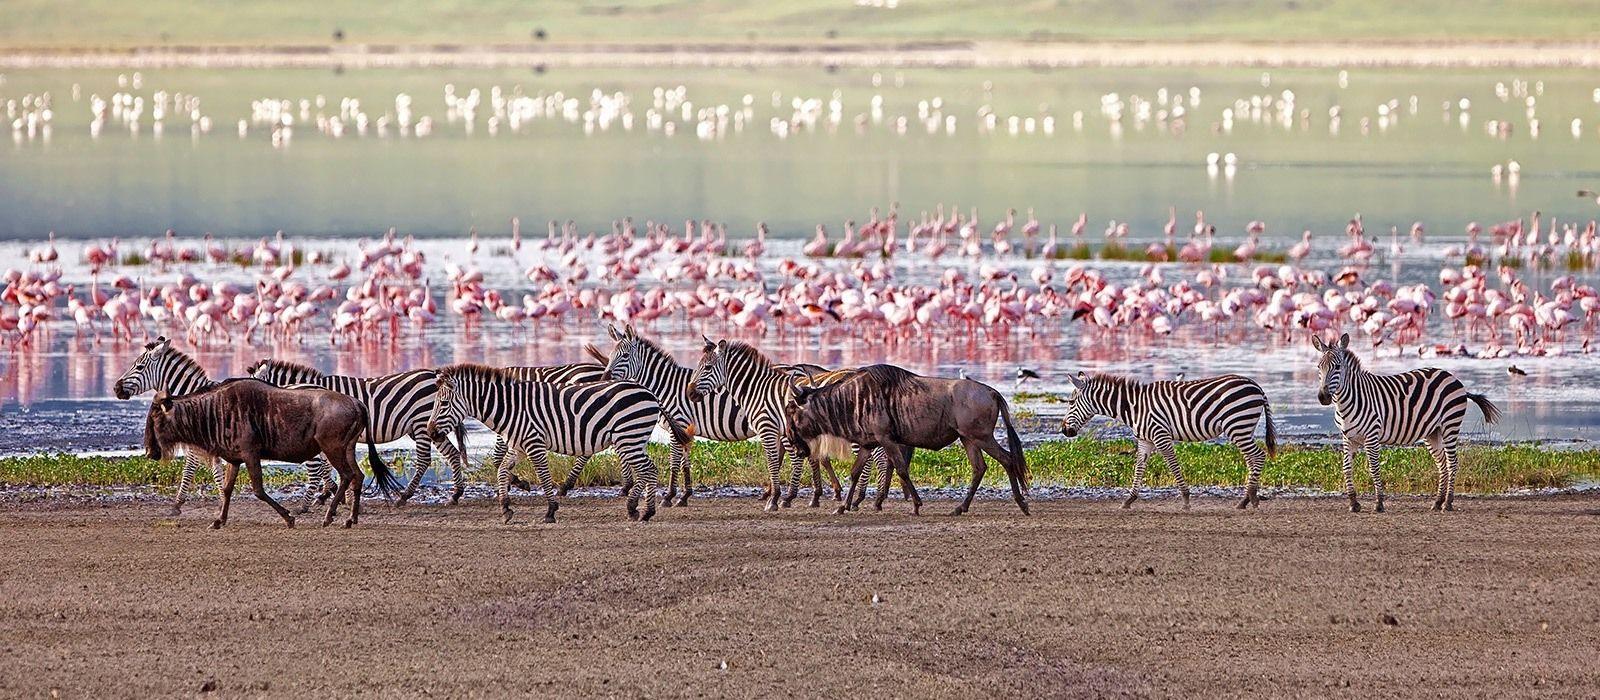 Lakeside Luxury, Wilderness and Wildlife in Tanzania Tour Trip 5